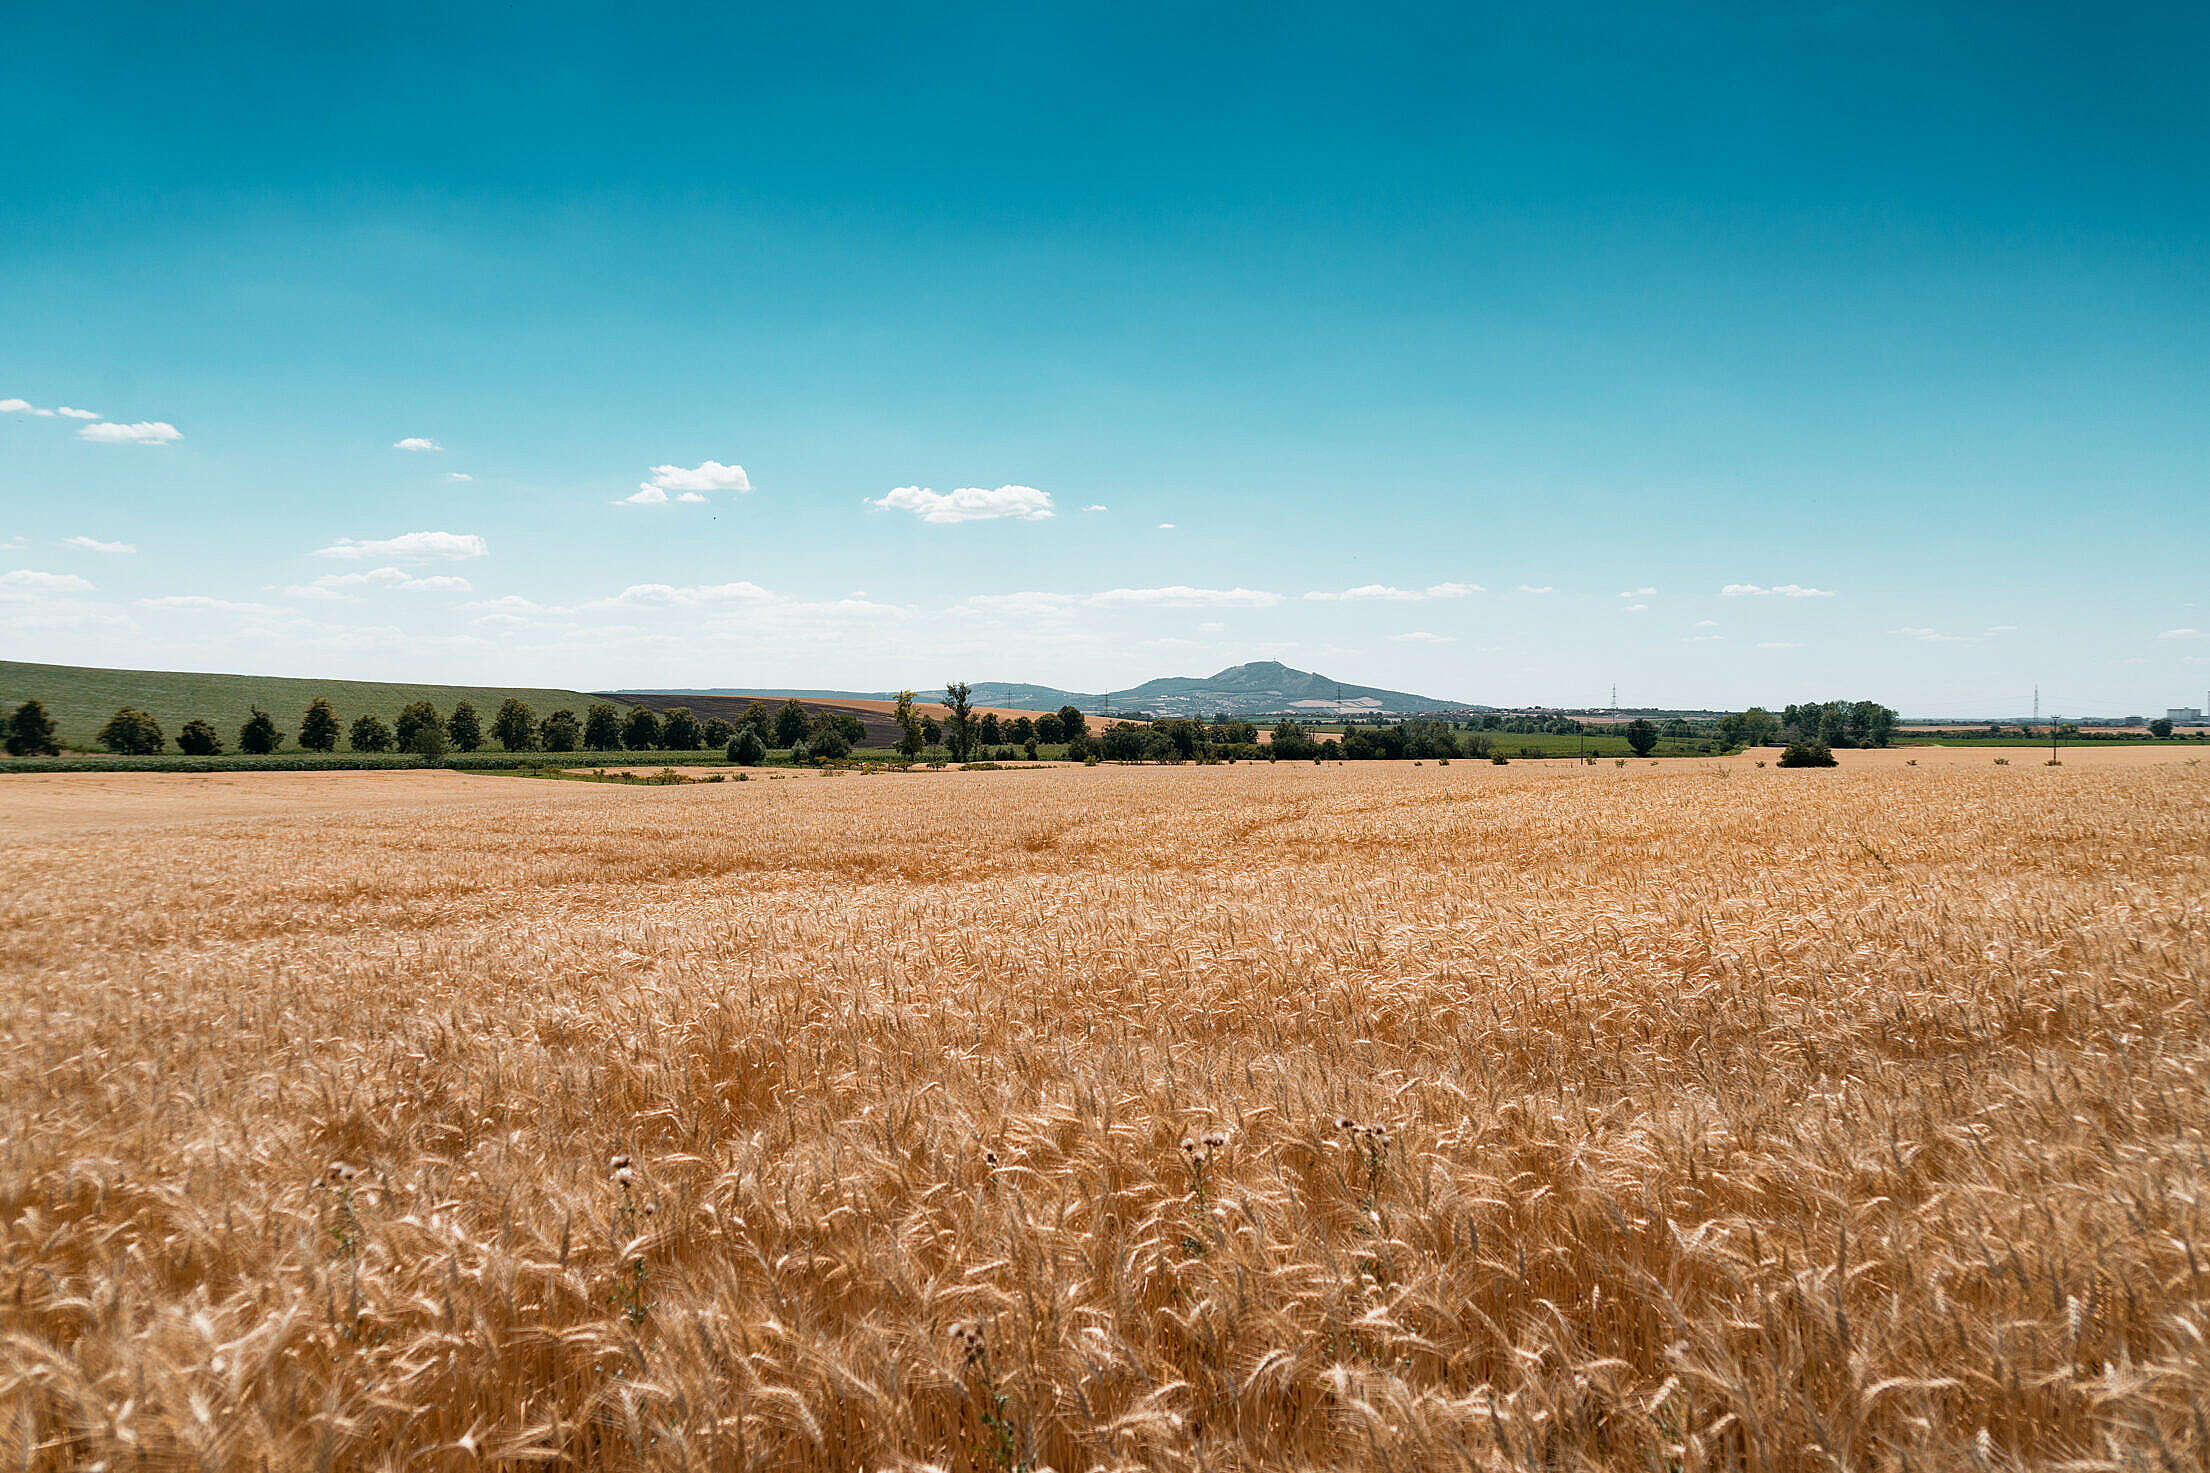 Palava Hills Panorama, South Moravia, Czechia Free Stock Photo